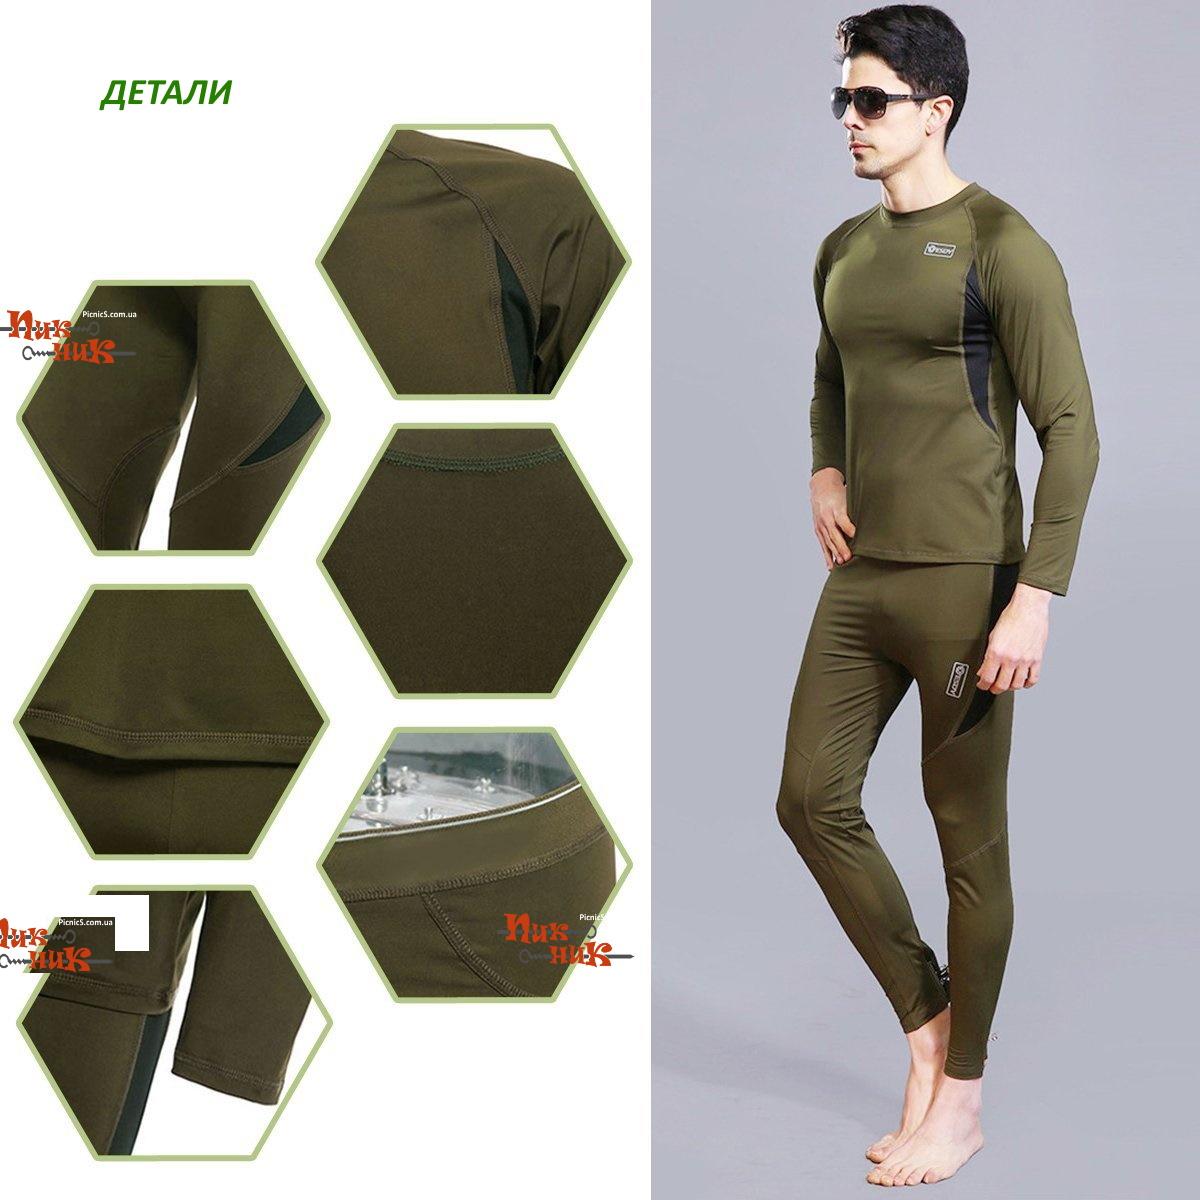 армейское термобелье мужское